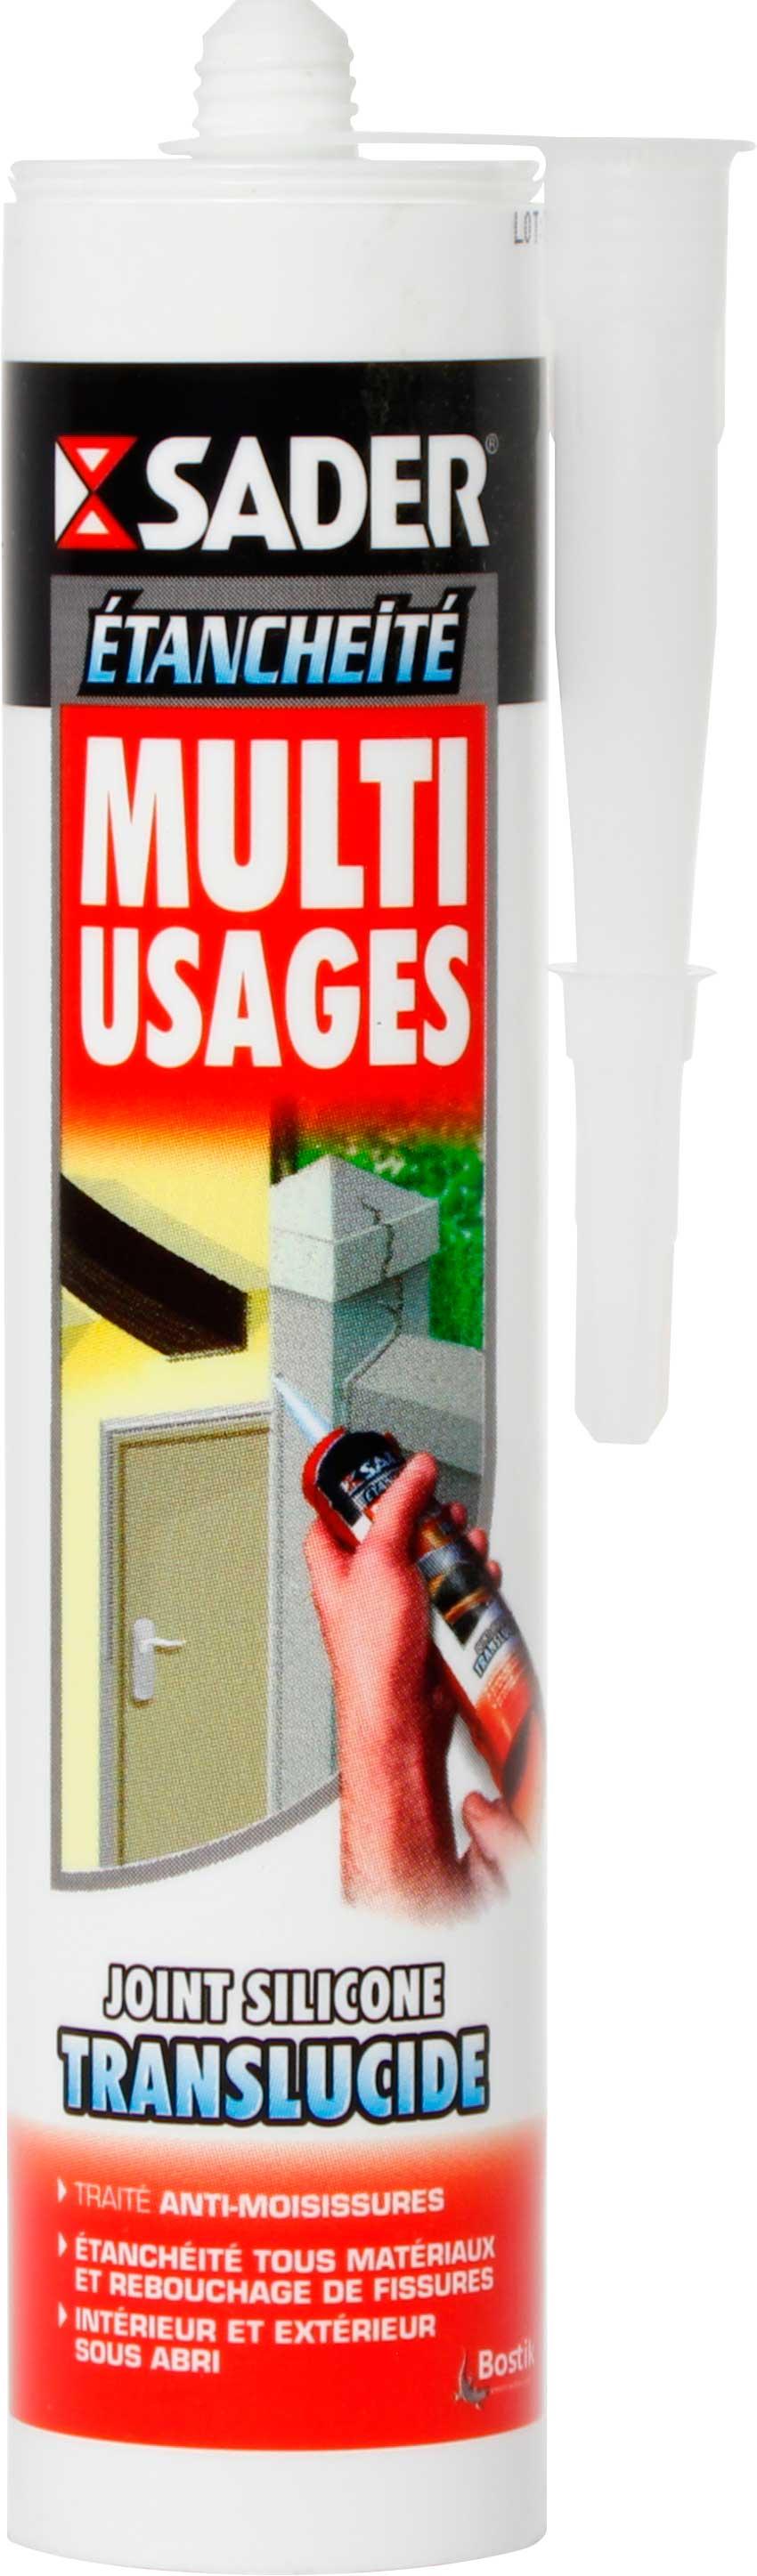 mastic multi usages sader cartouche 310 ml translucide de mastic multi usages. Black Bedroom Furniture Sets. Home Design Ideas